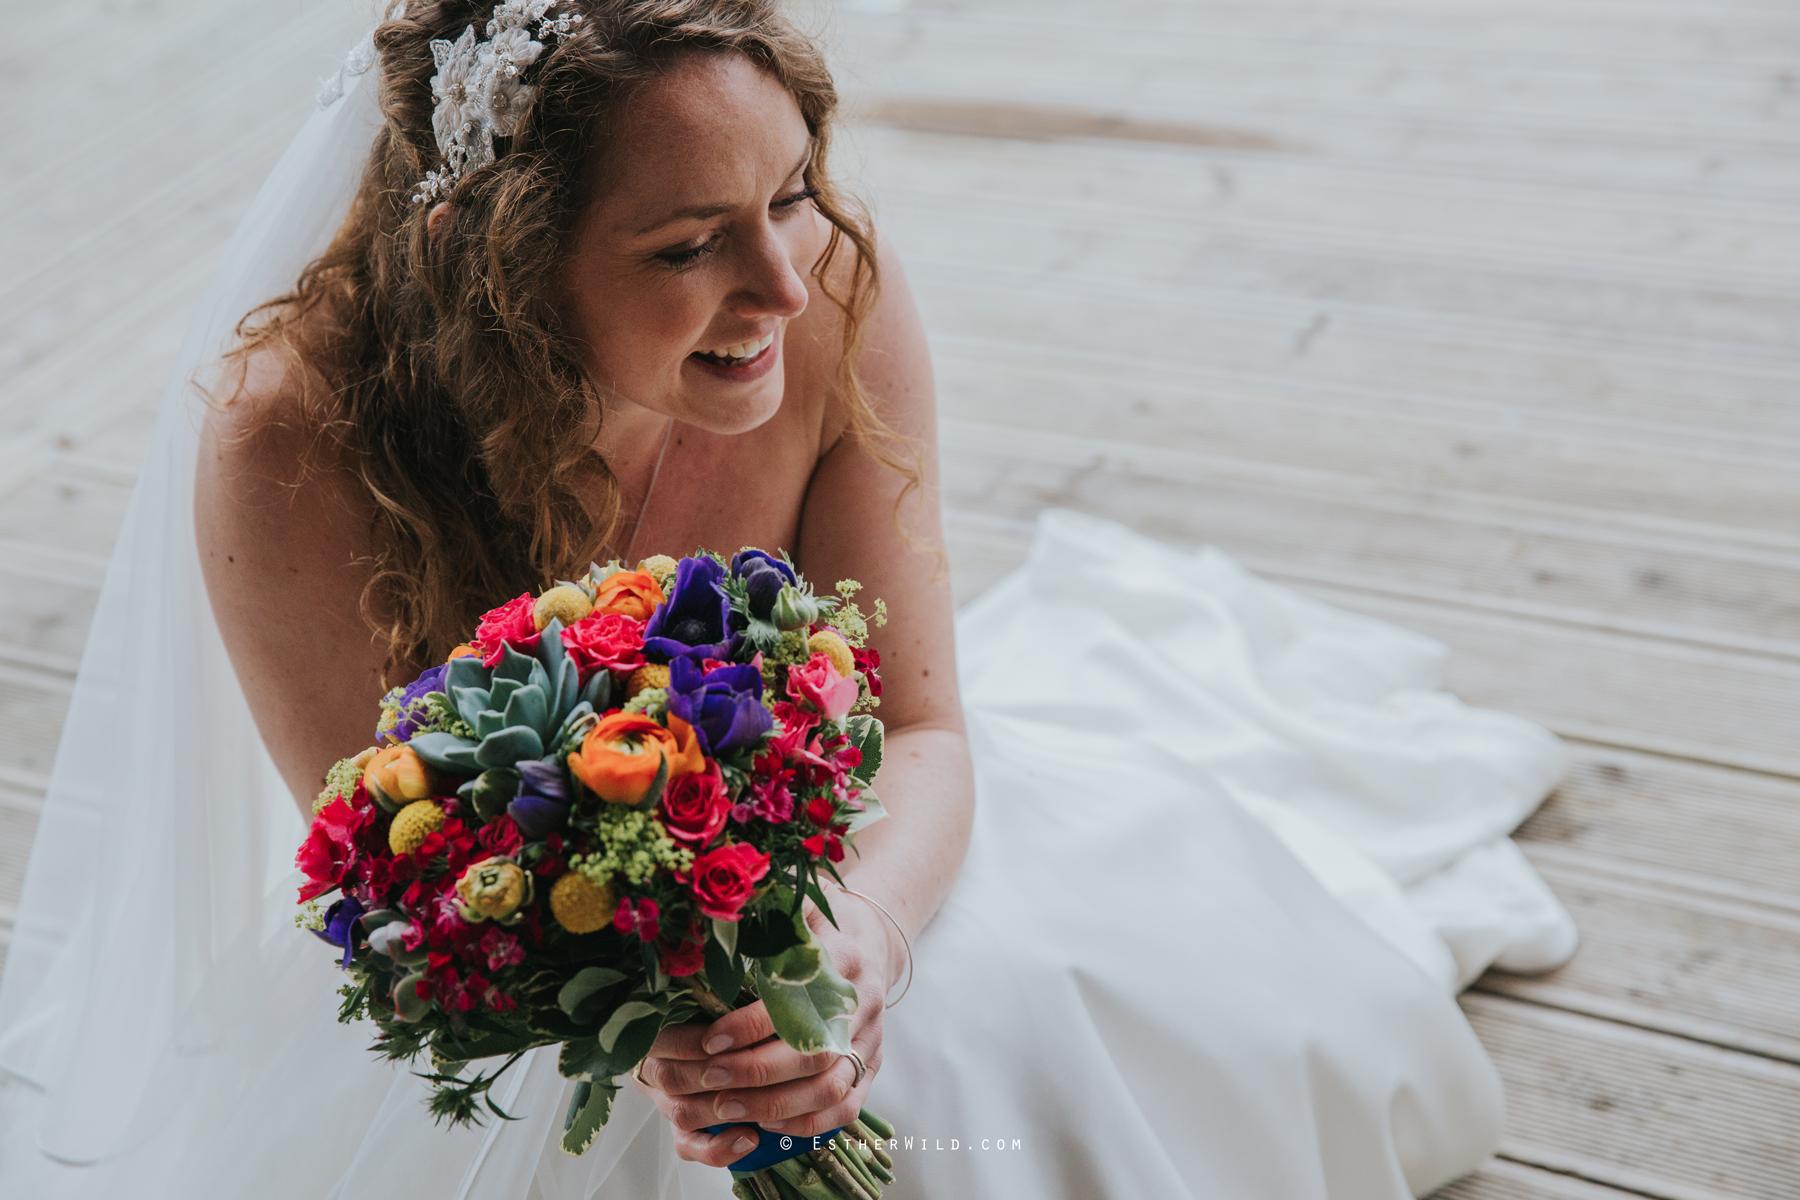 The_BoatHouse_Wedding_Venue_Ormesby_Norfolk_Broads_Boat_Wedding_Photography_Esther_Wild_Photographer_IMG_2111.jpg